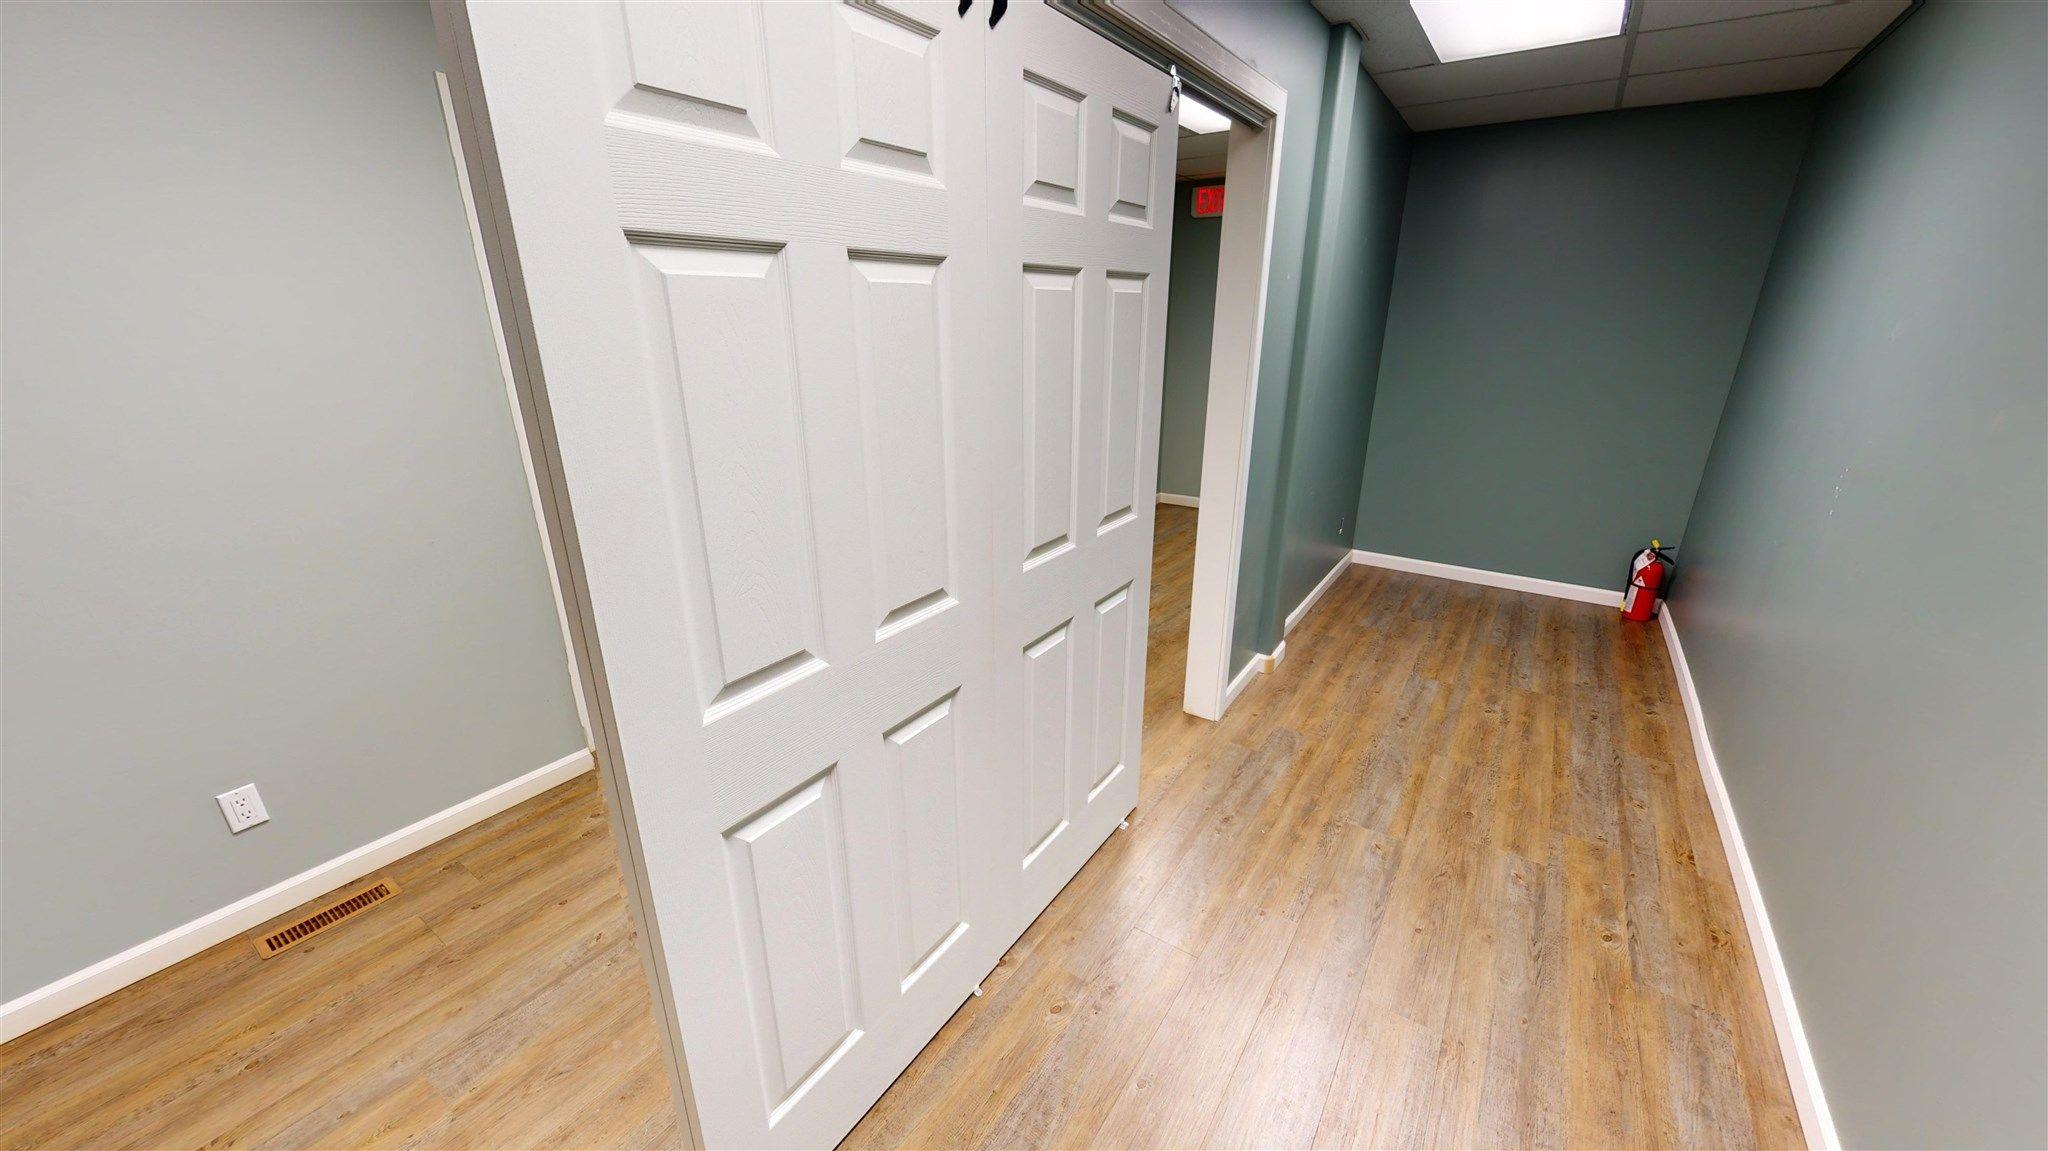 Photo 22: Photos: 10067 100 Avenue in Fort St. John: Fort St. John - City NW Office for sale (Fort St. John (Zone 60))  : MLS®# C8039097